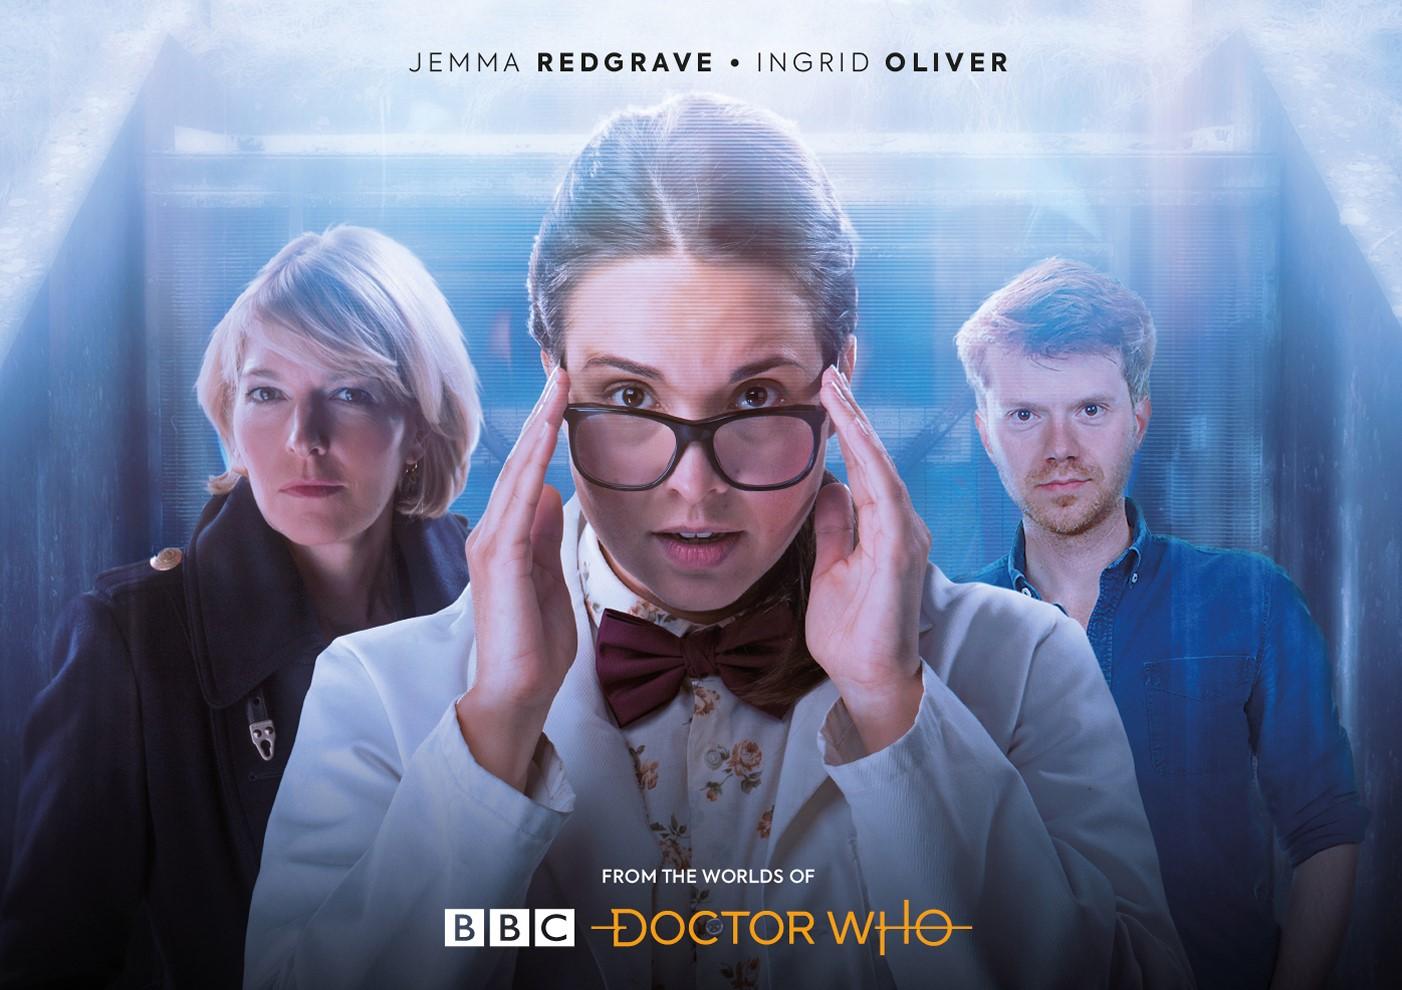 Slender teen annihilated a bbc